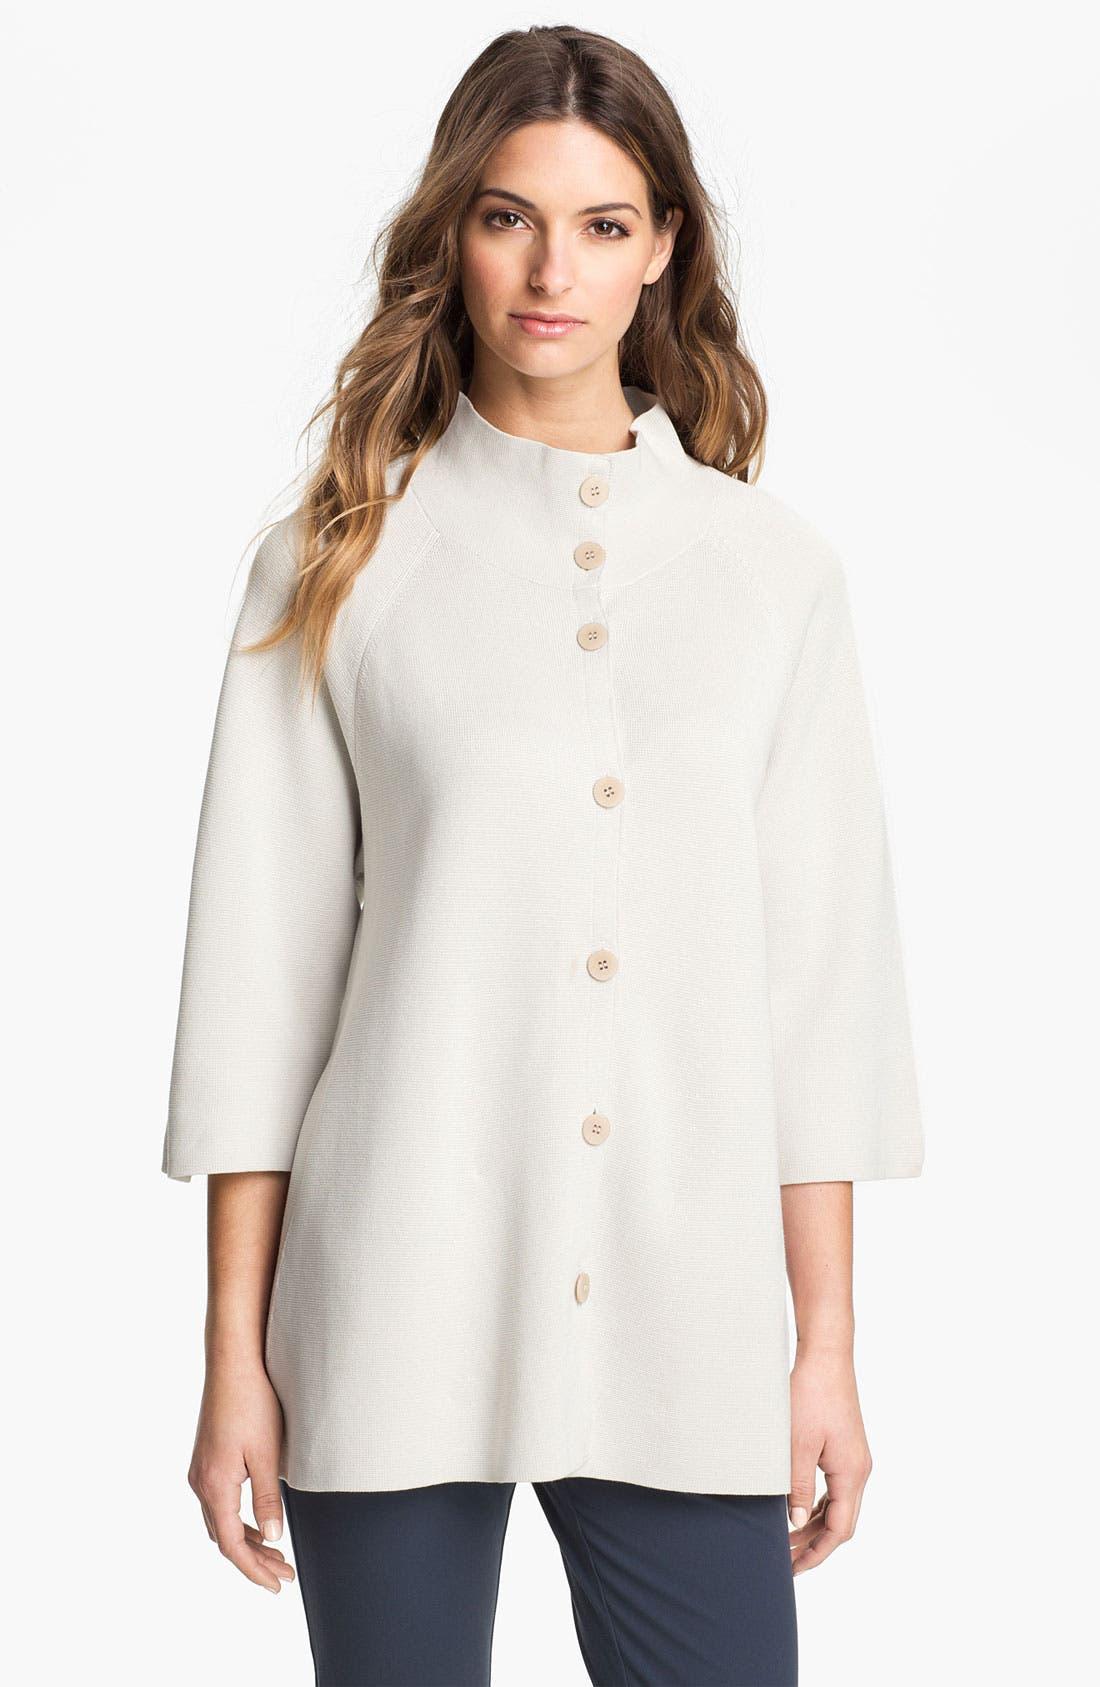 Main Image - Eileen Fisher Silk & Cotton Interlock Knit Jacket (Petite)